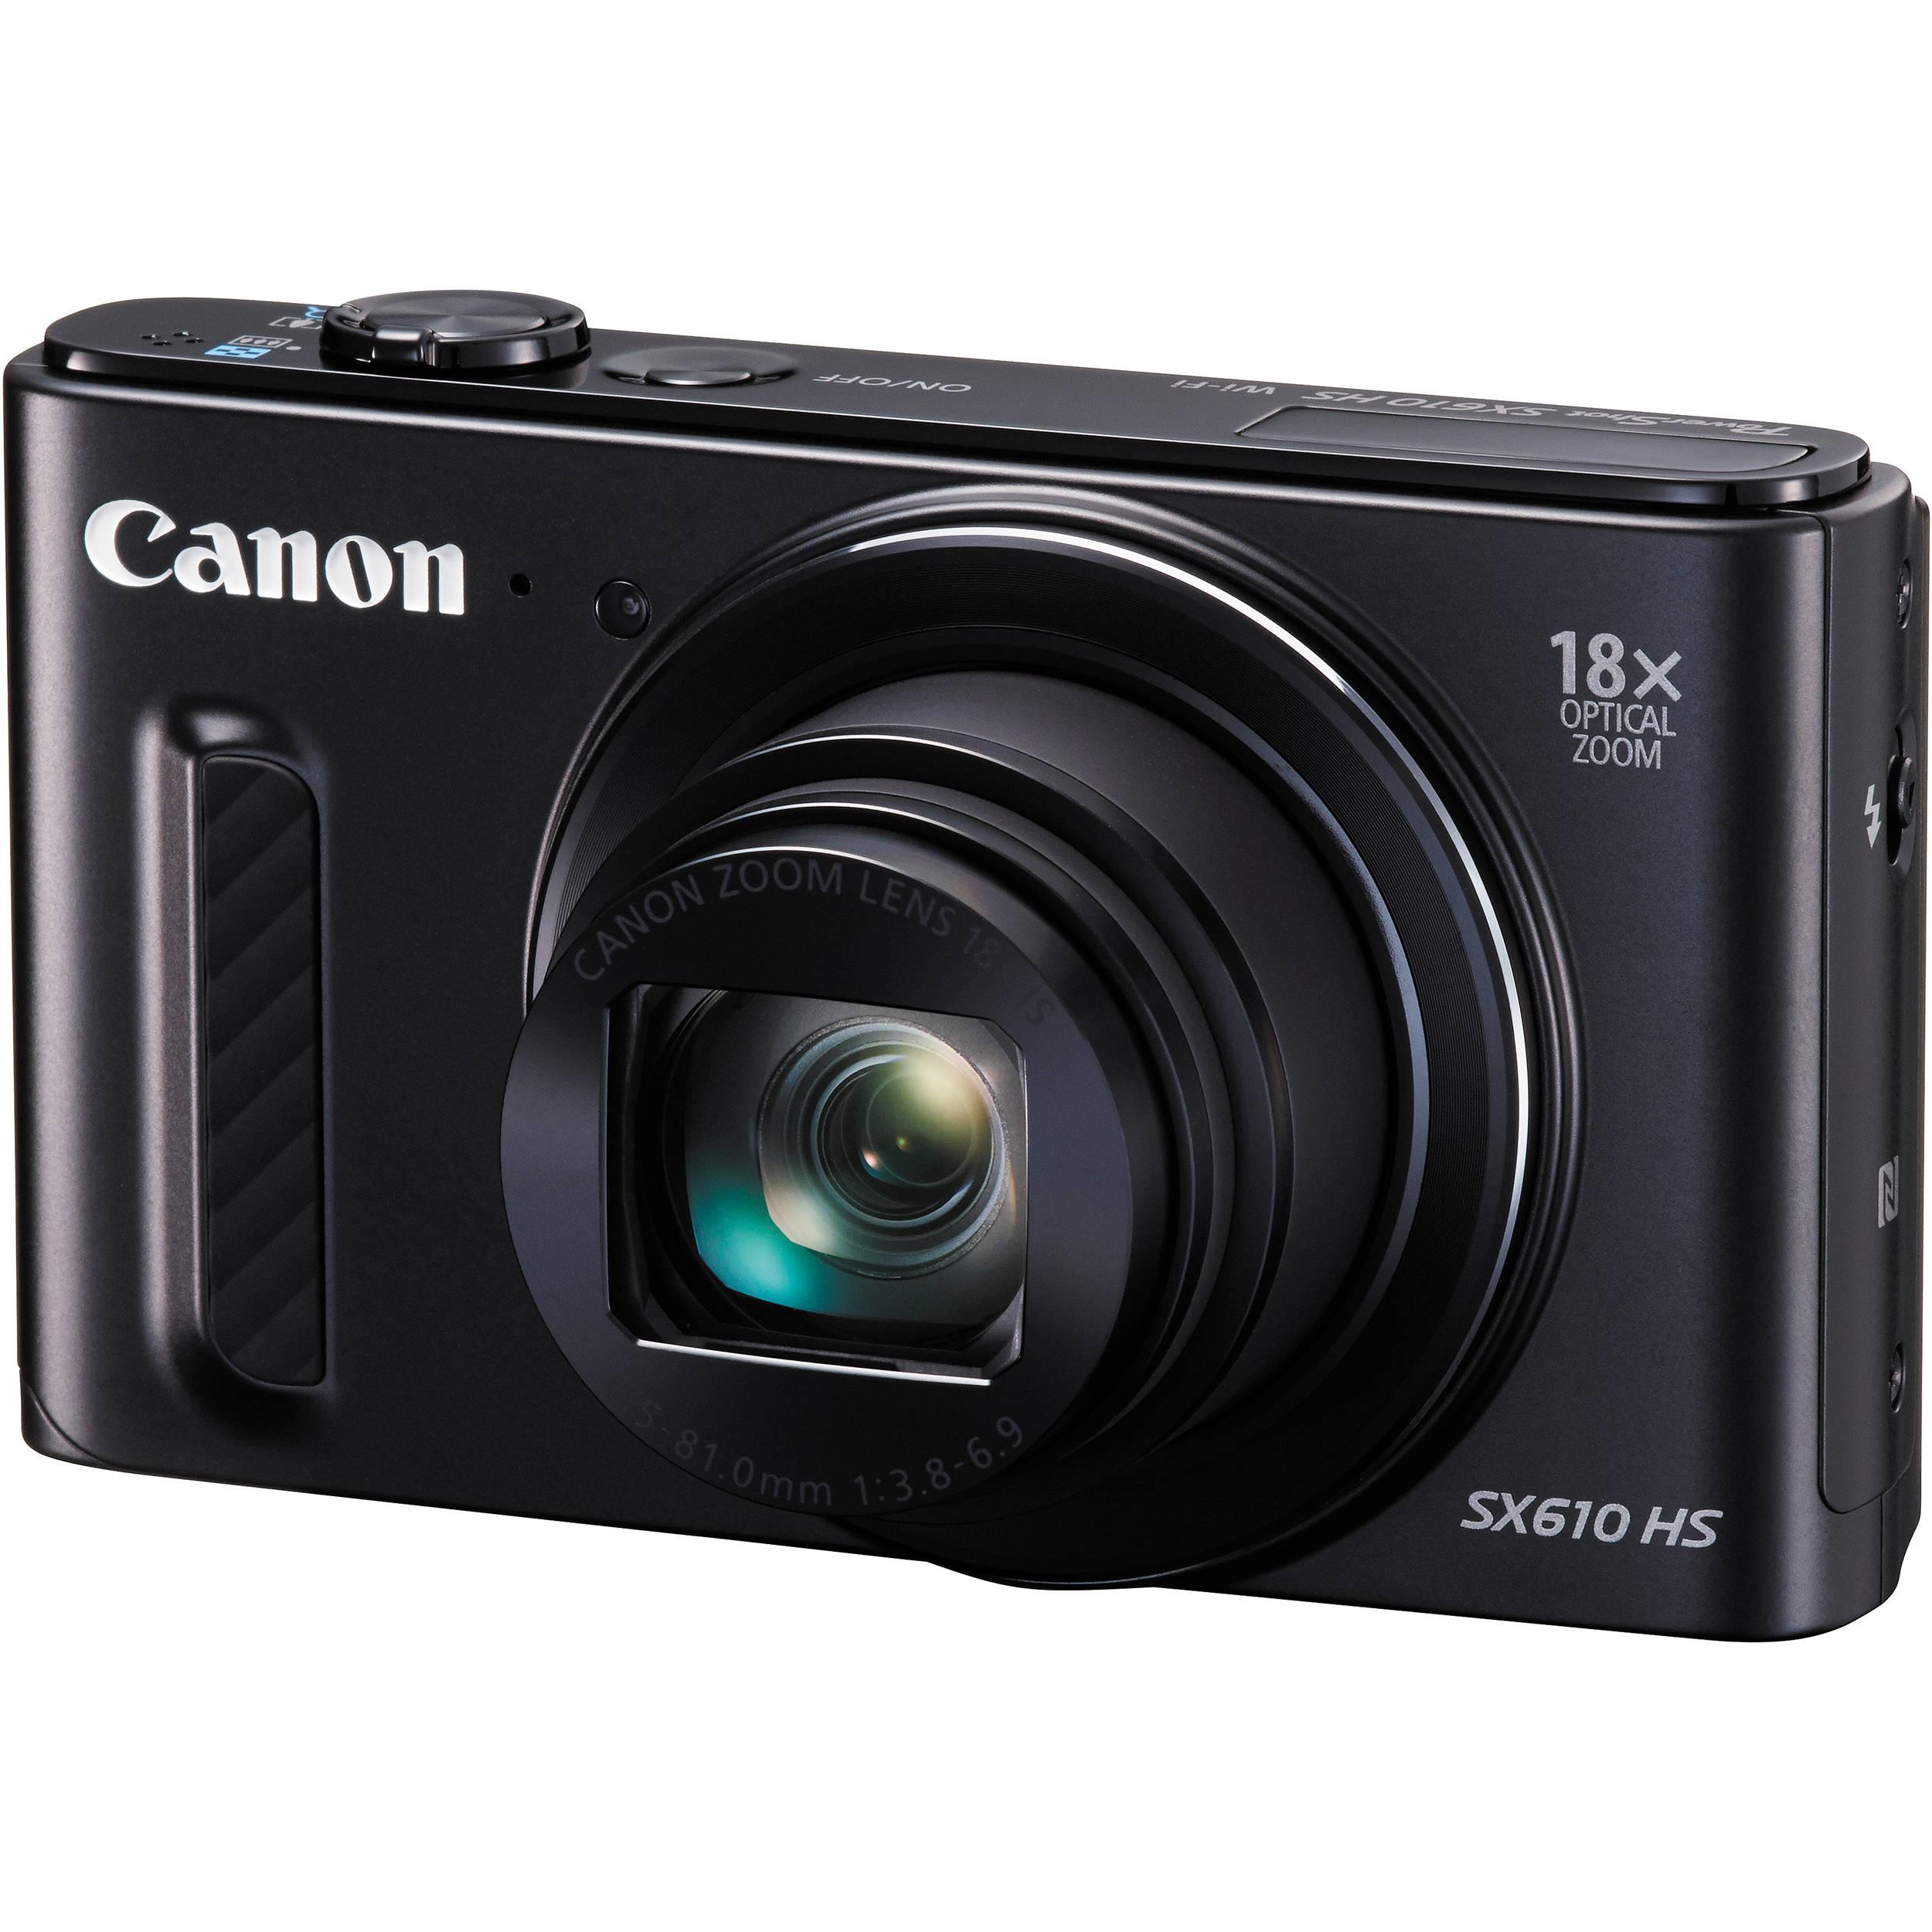 Canon PowerShot SX610 HS Digital Camera (Black) 0111C001 B&H